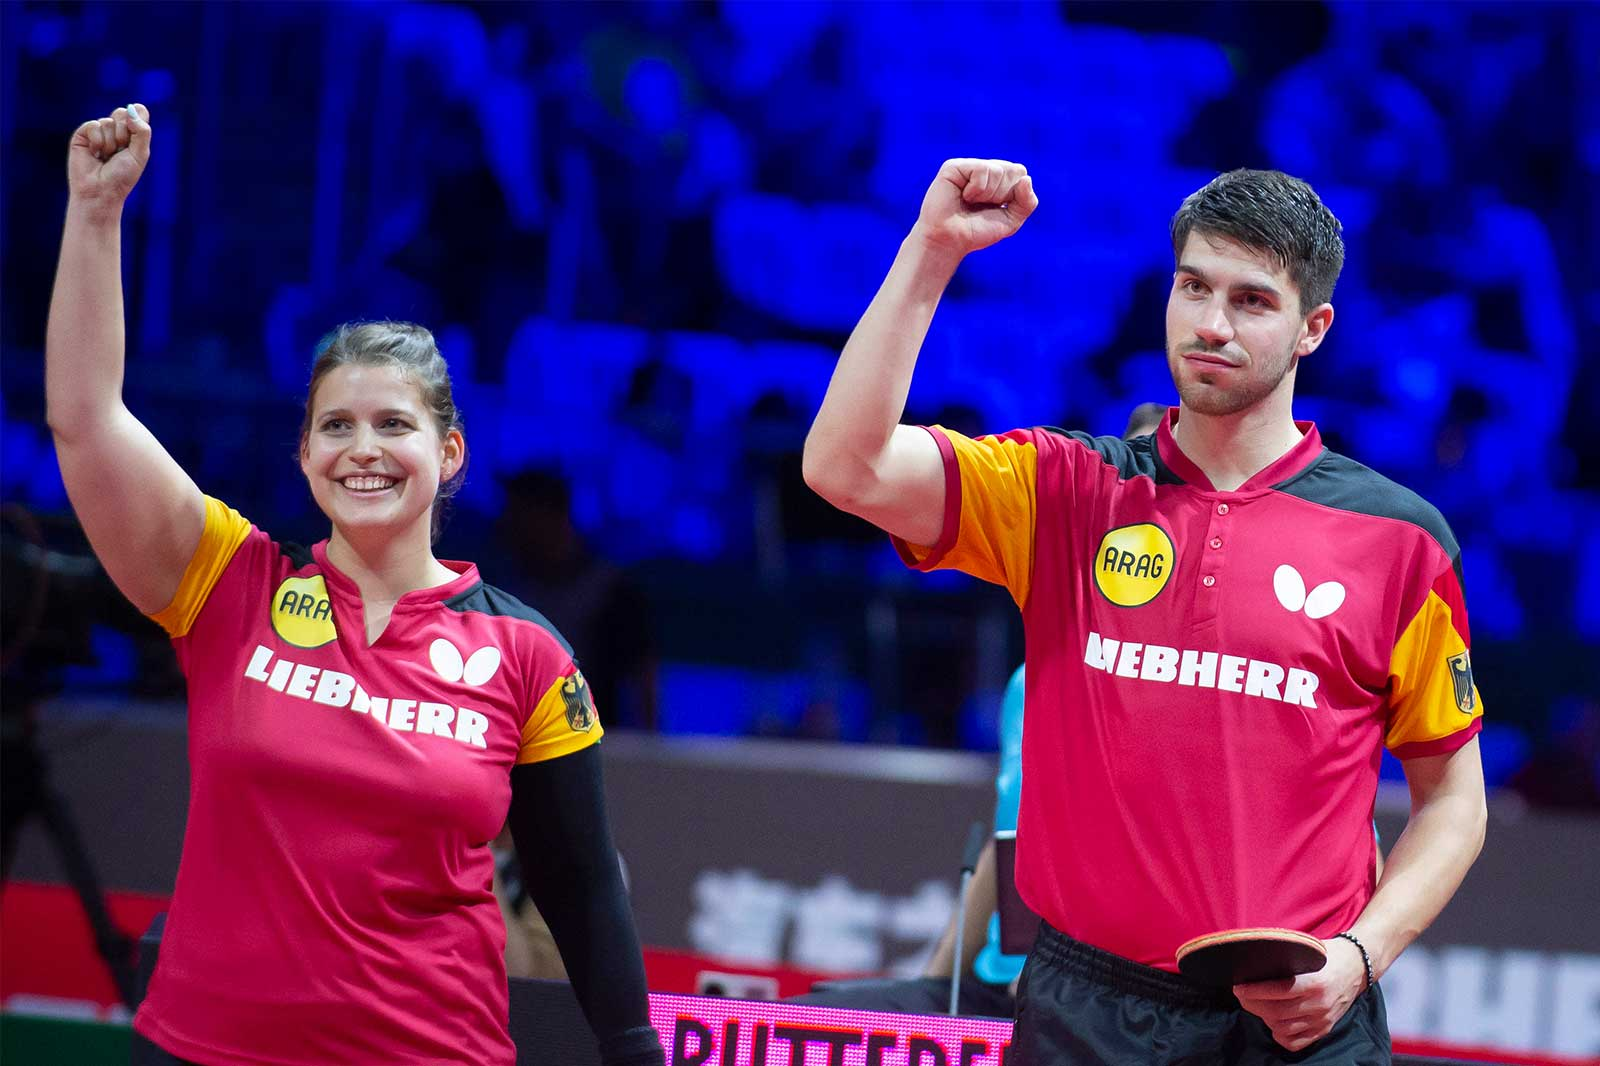 Geschafft - Sieg Viertelfinale Mixed WM 2019 Budapest (Foto: Manfred Schillings)